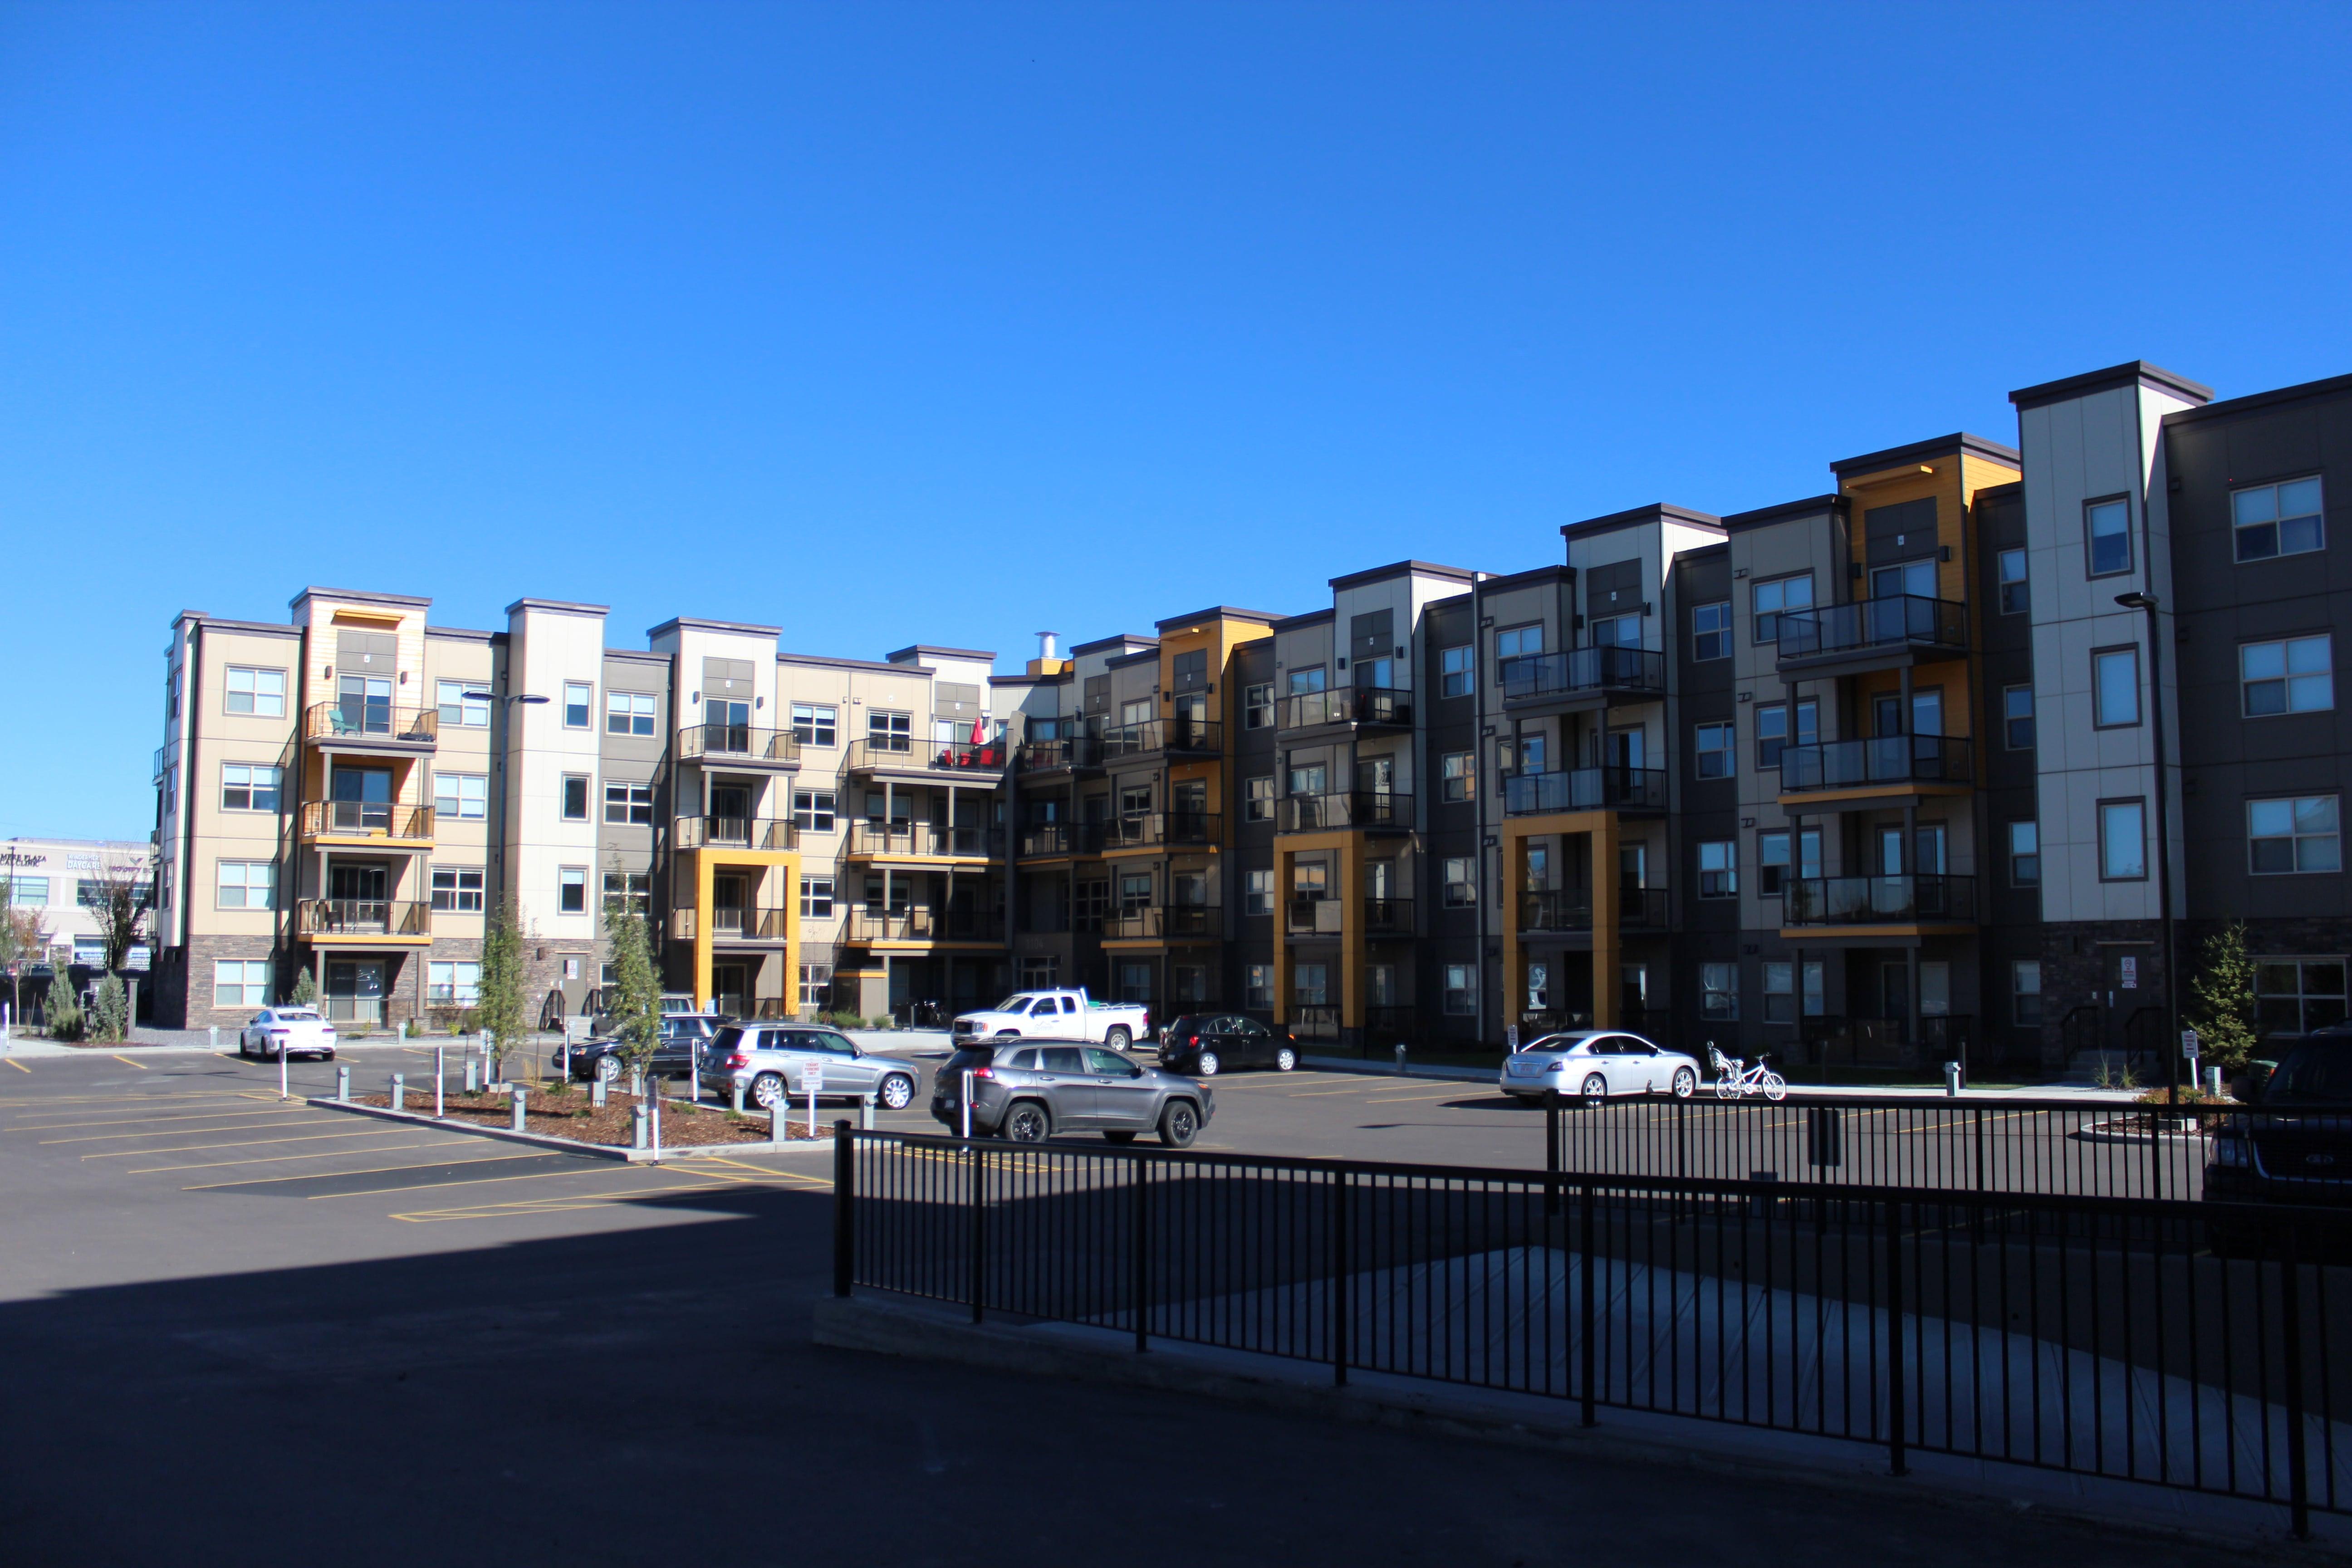 Upper Windermere Condominiums (85 units) Completed June 2017